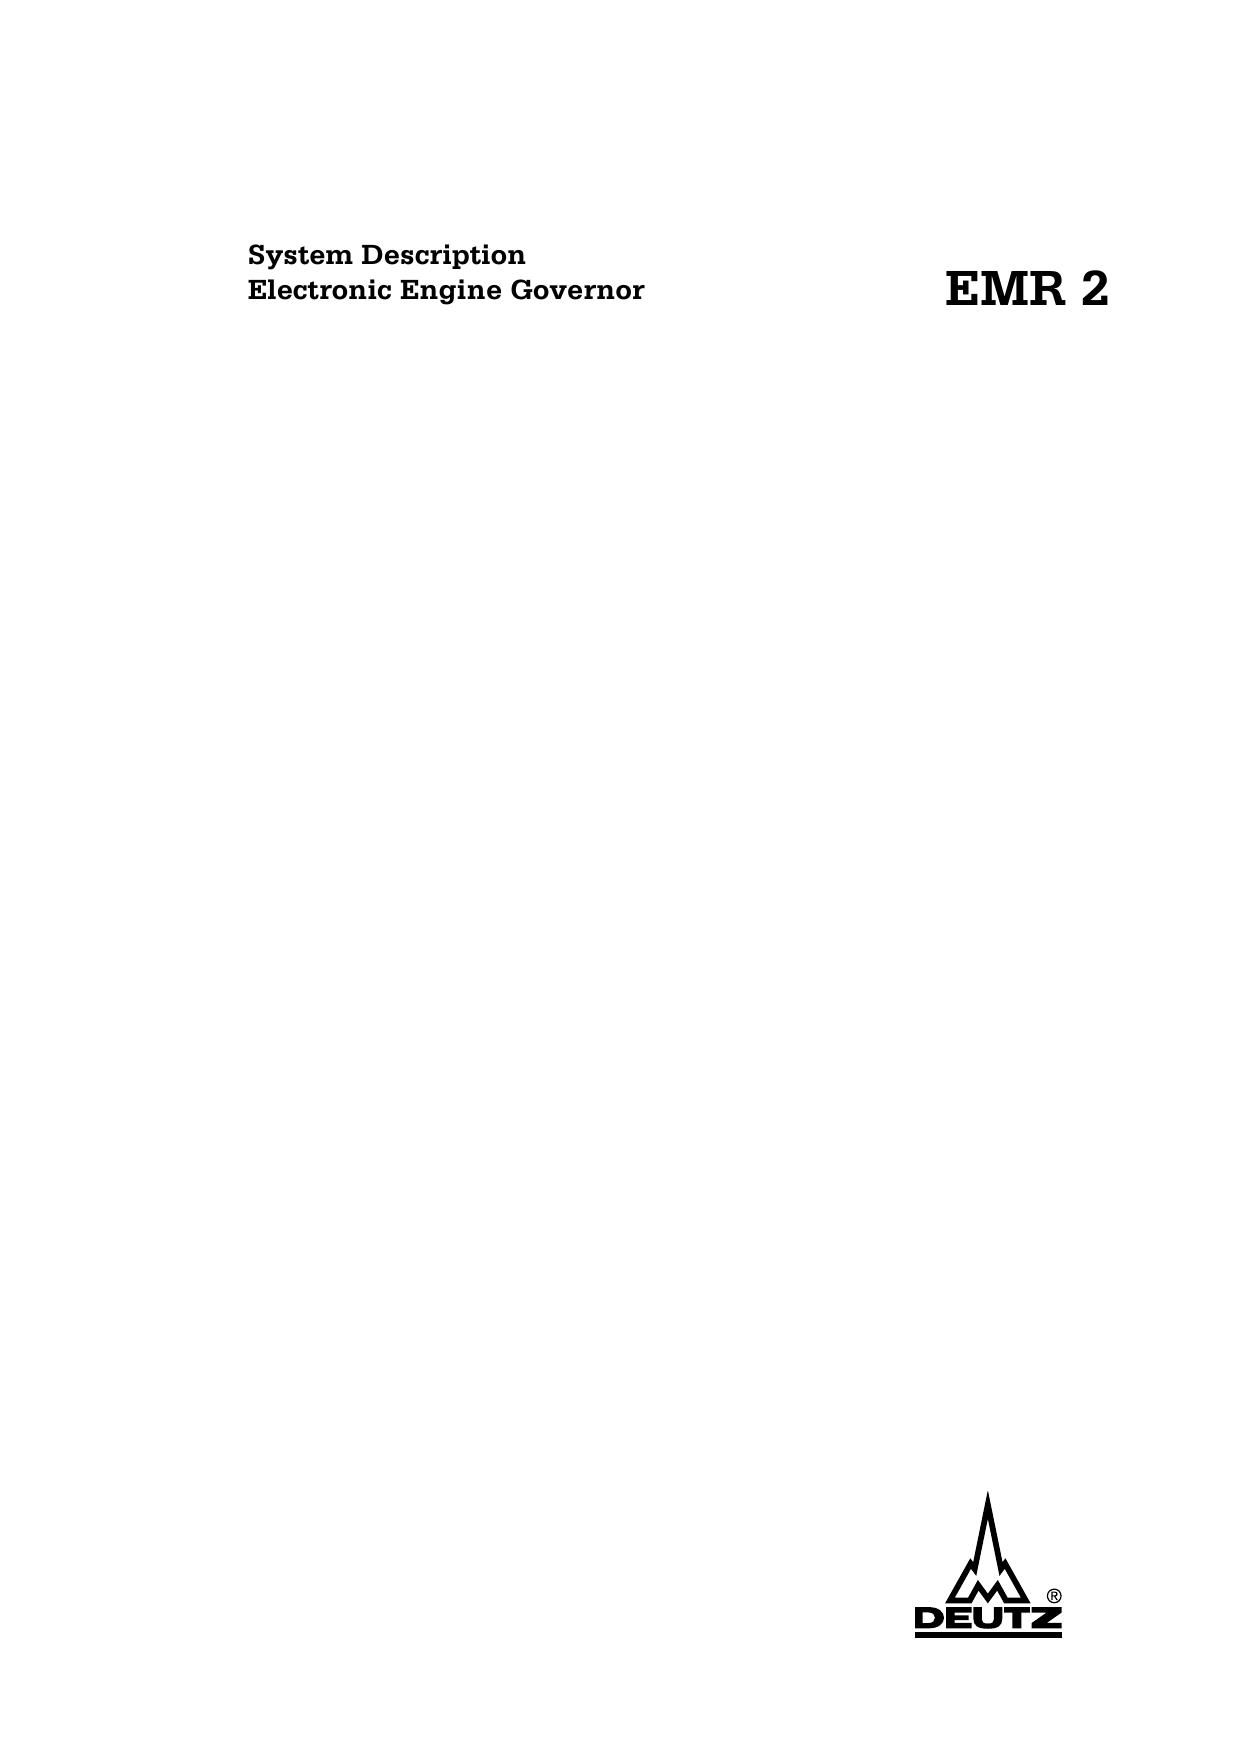 deutz emr2 wiring diagram 89 nissan 240sx system description electronic engine governor manualzz com